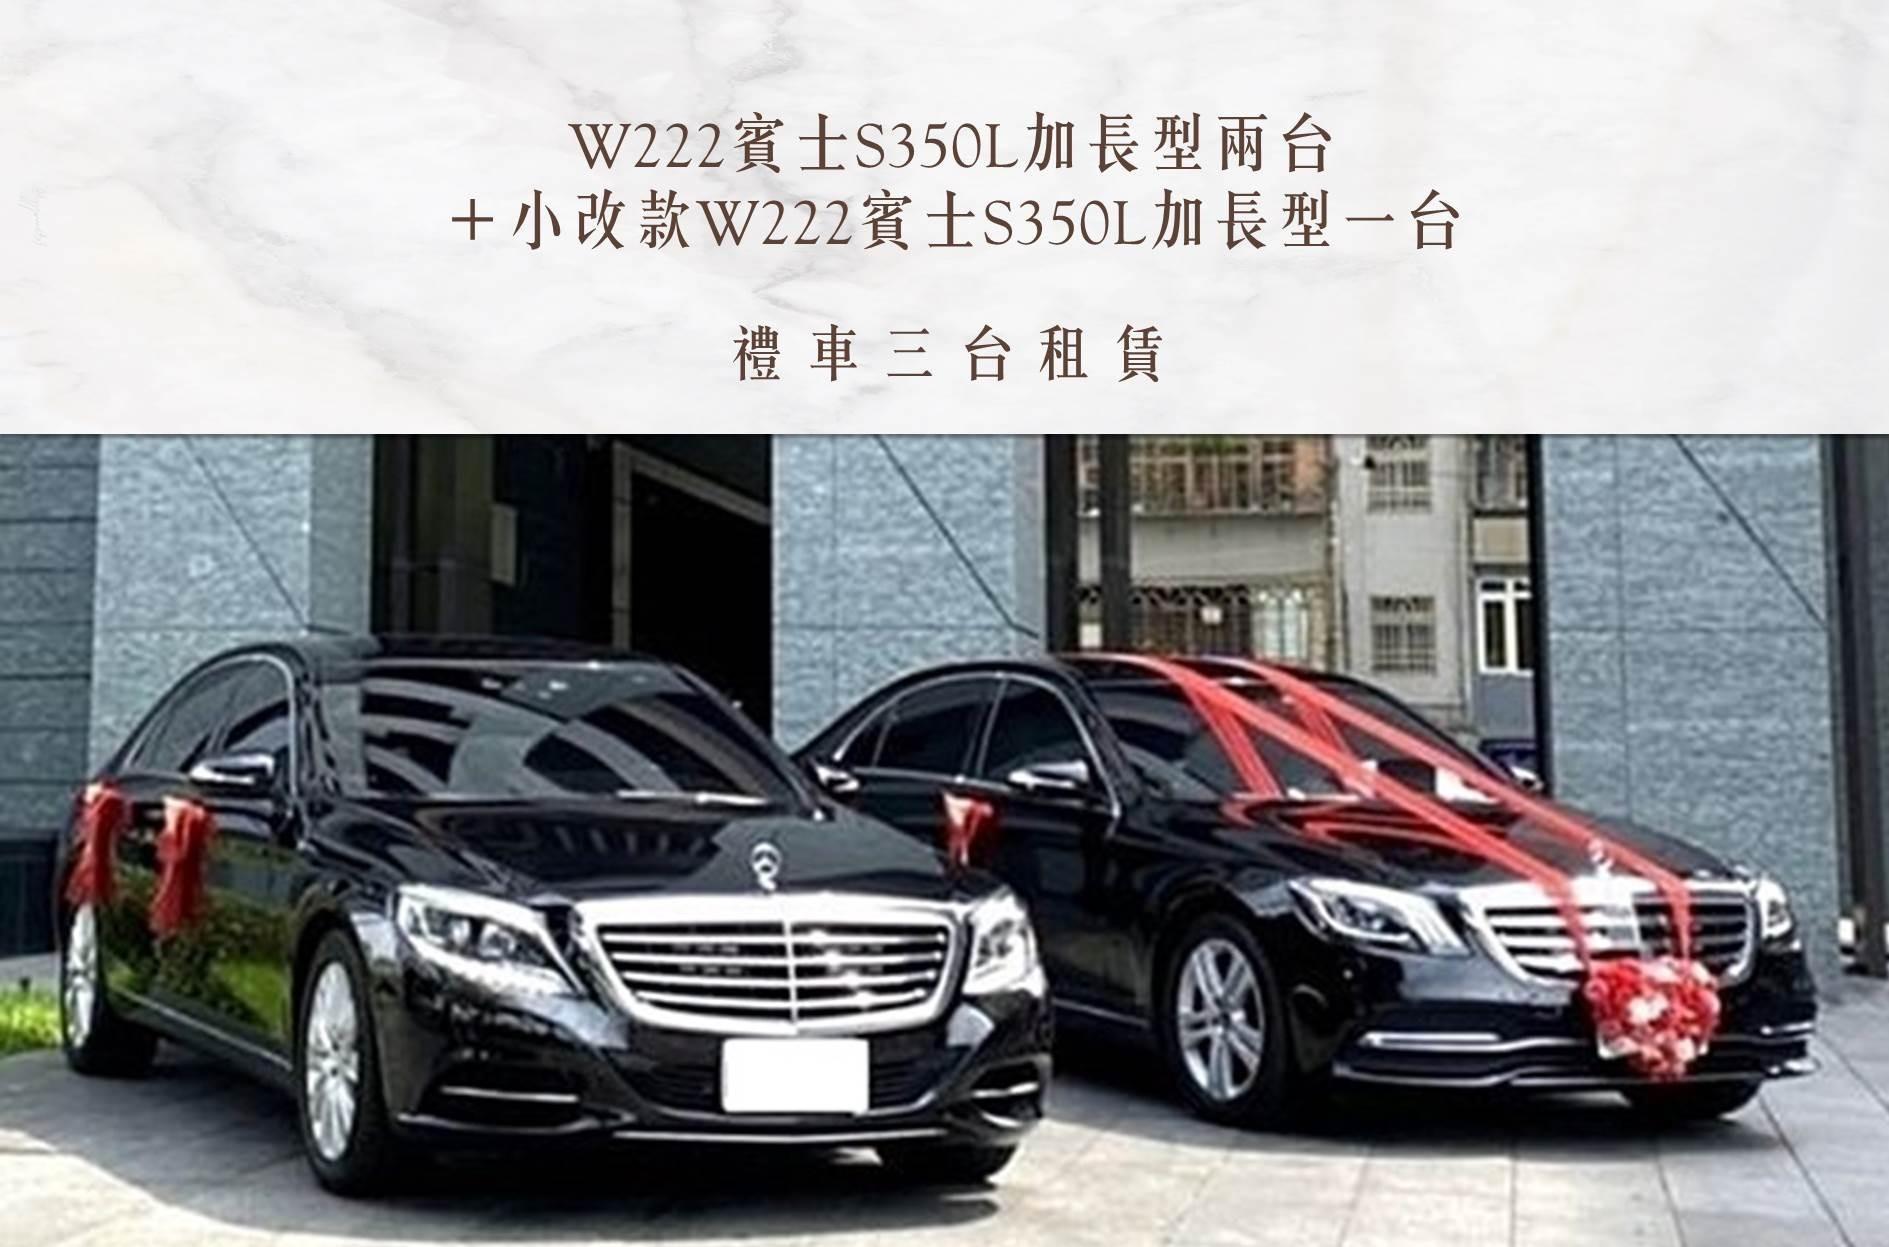 W222賓士S350L加長型兩台+小改款W222賓士S350L加長型一台